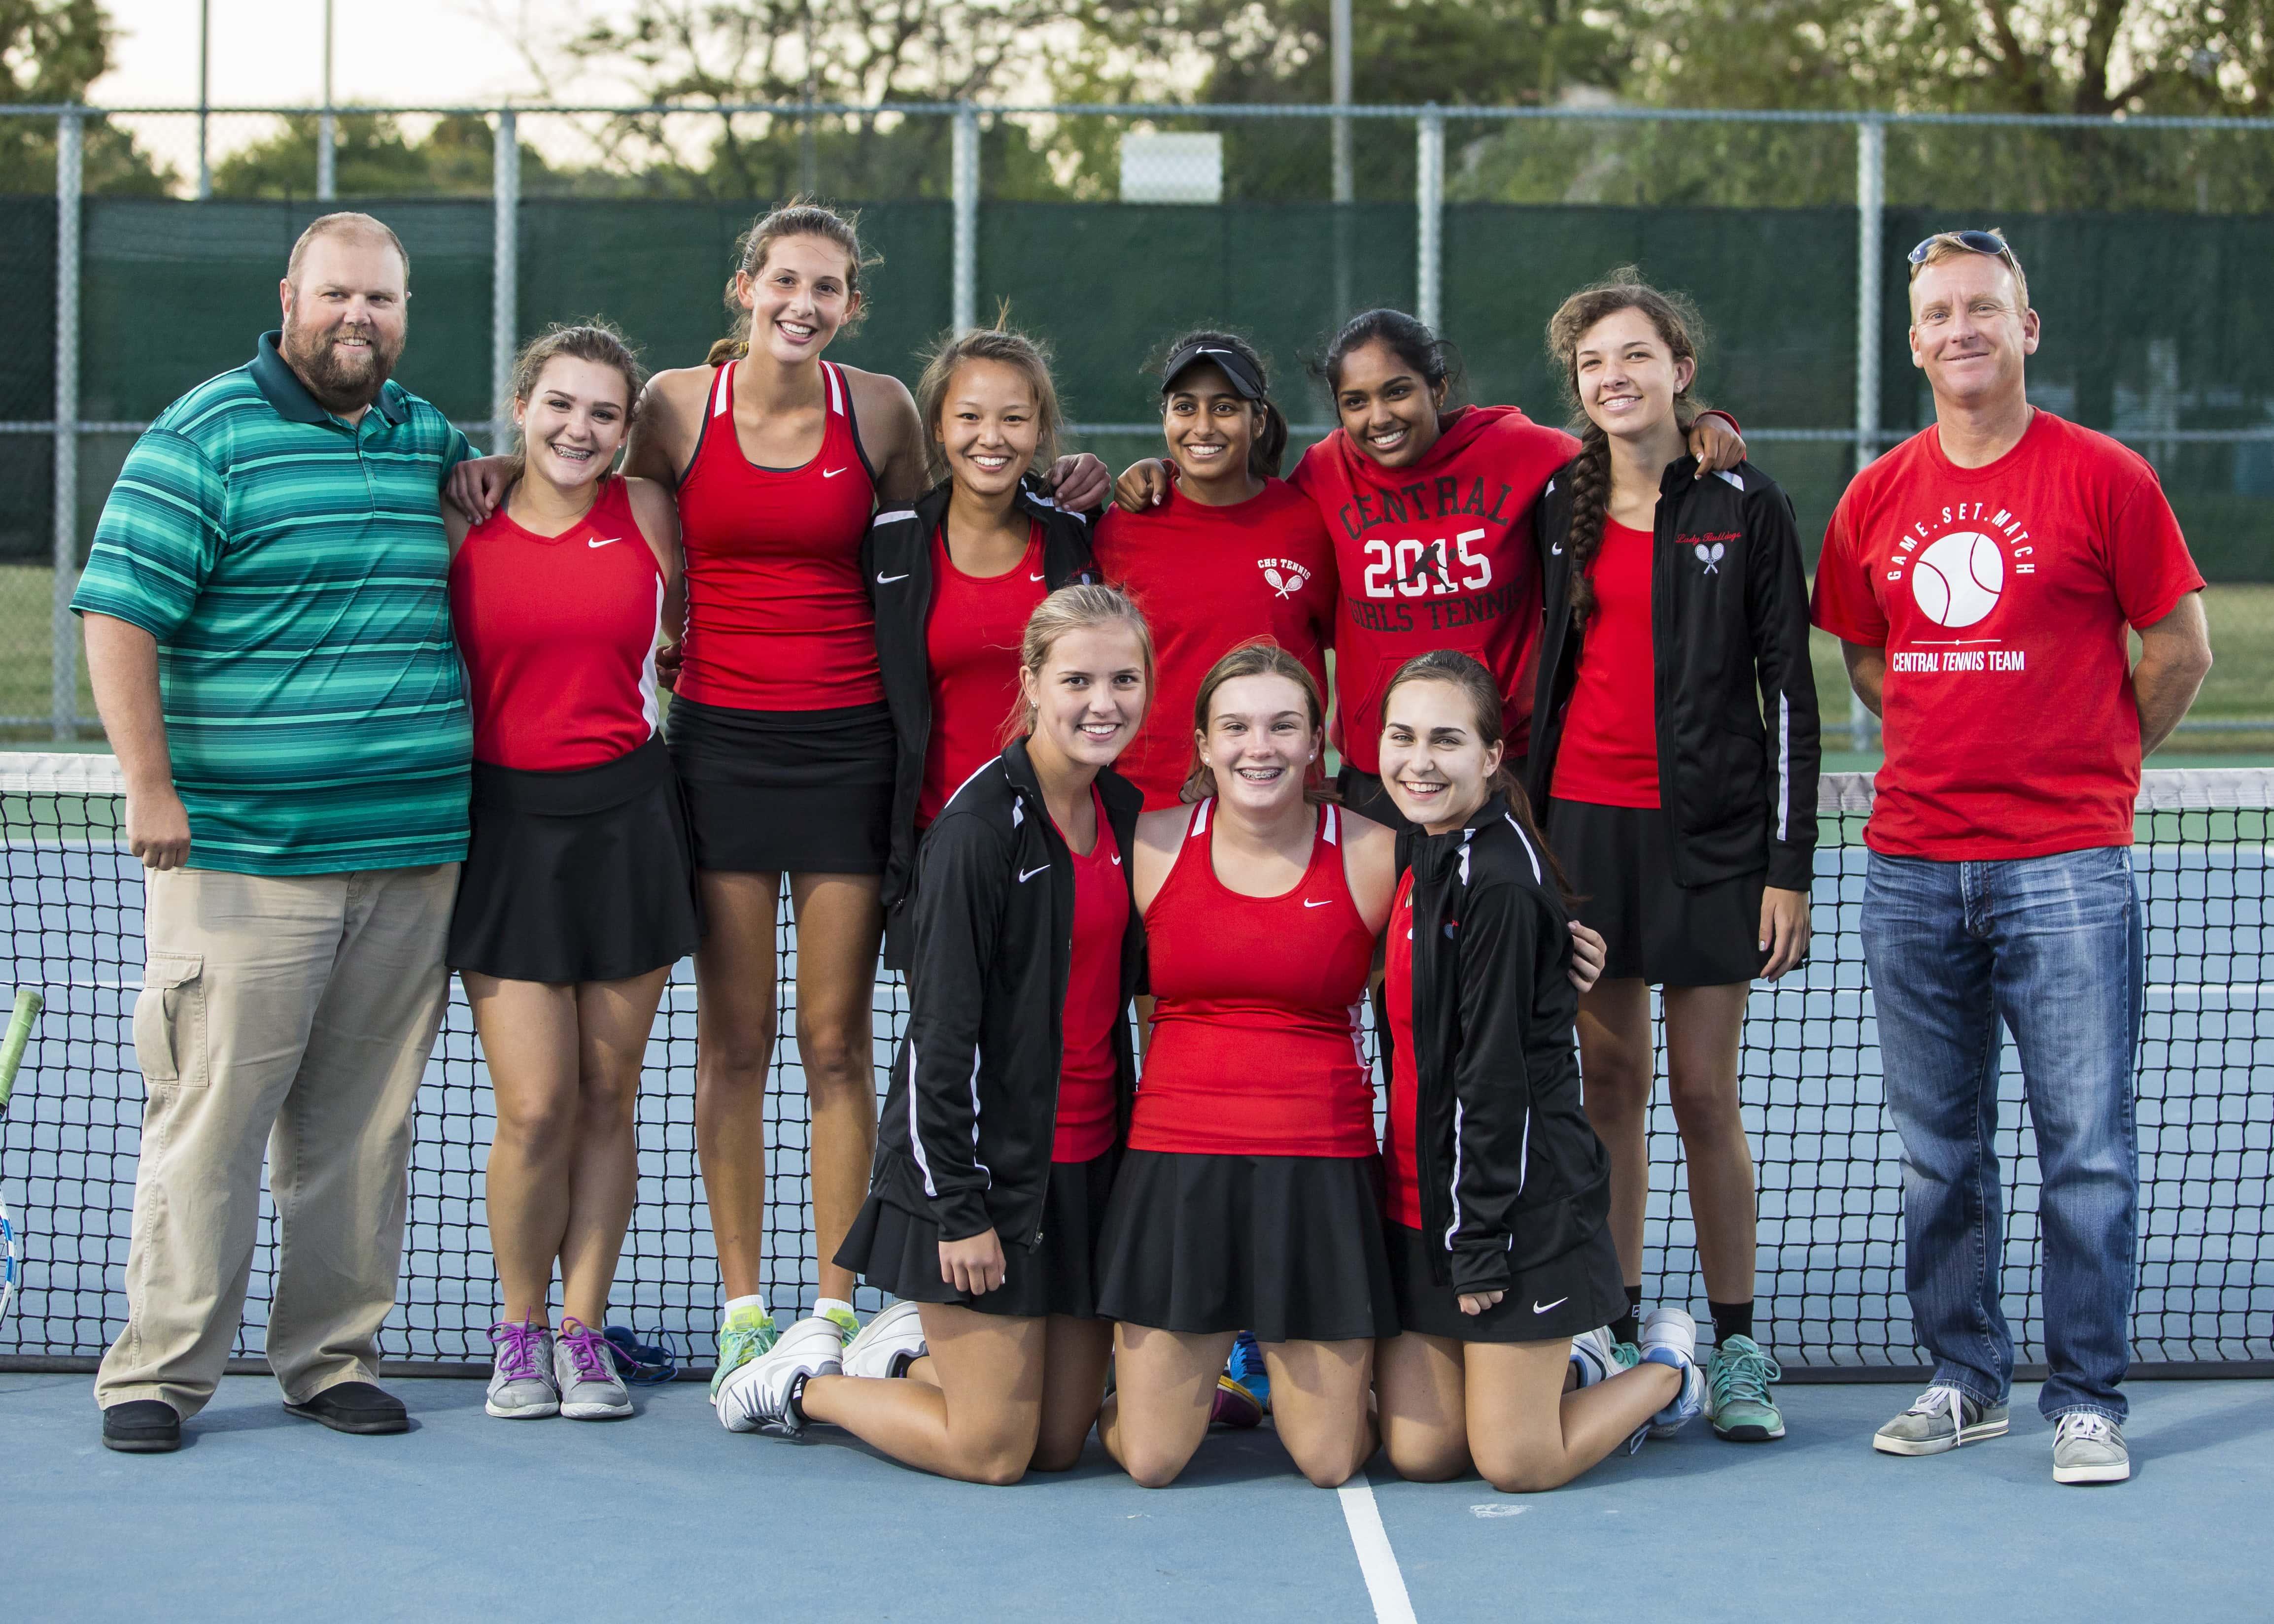 Central Tennis